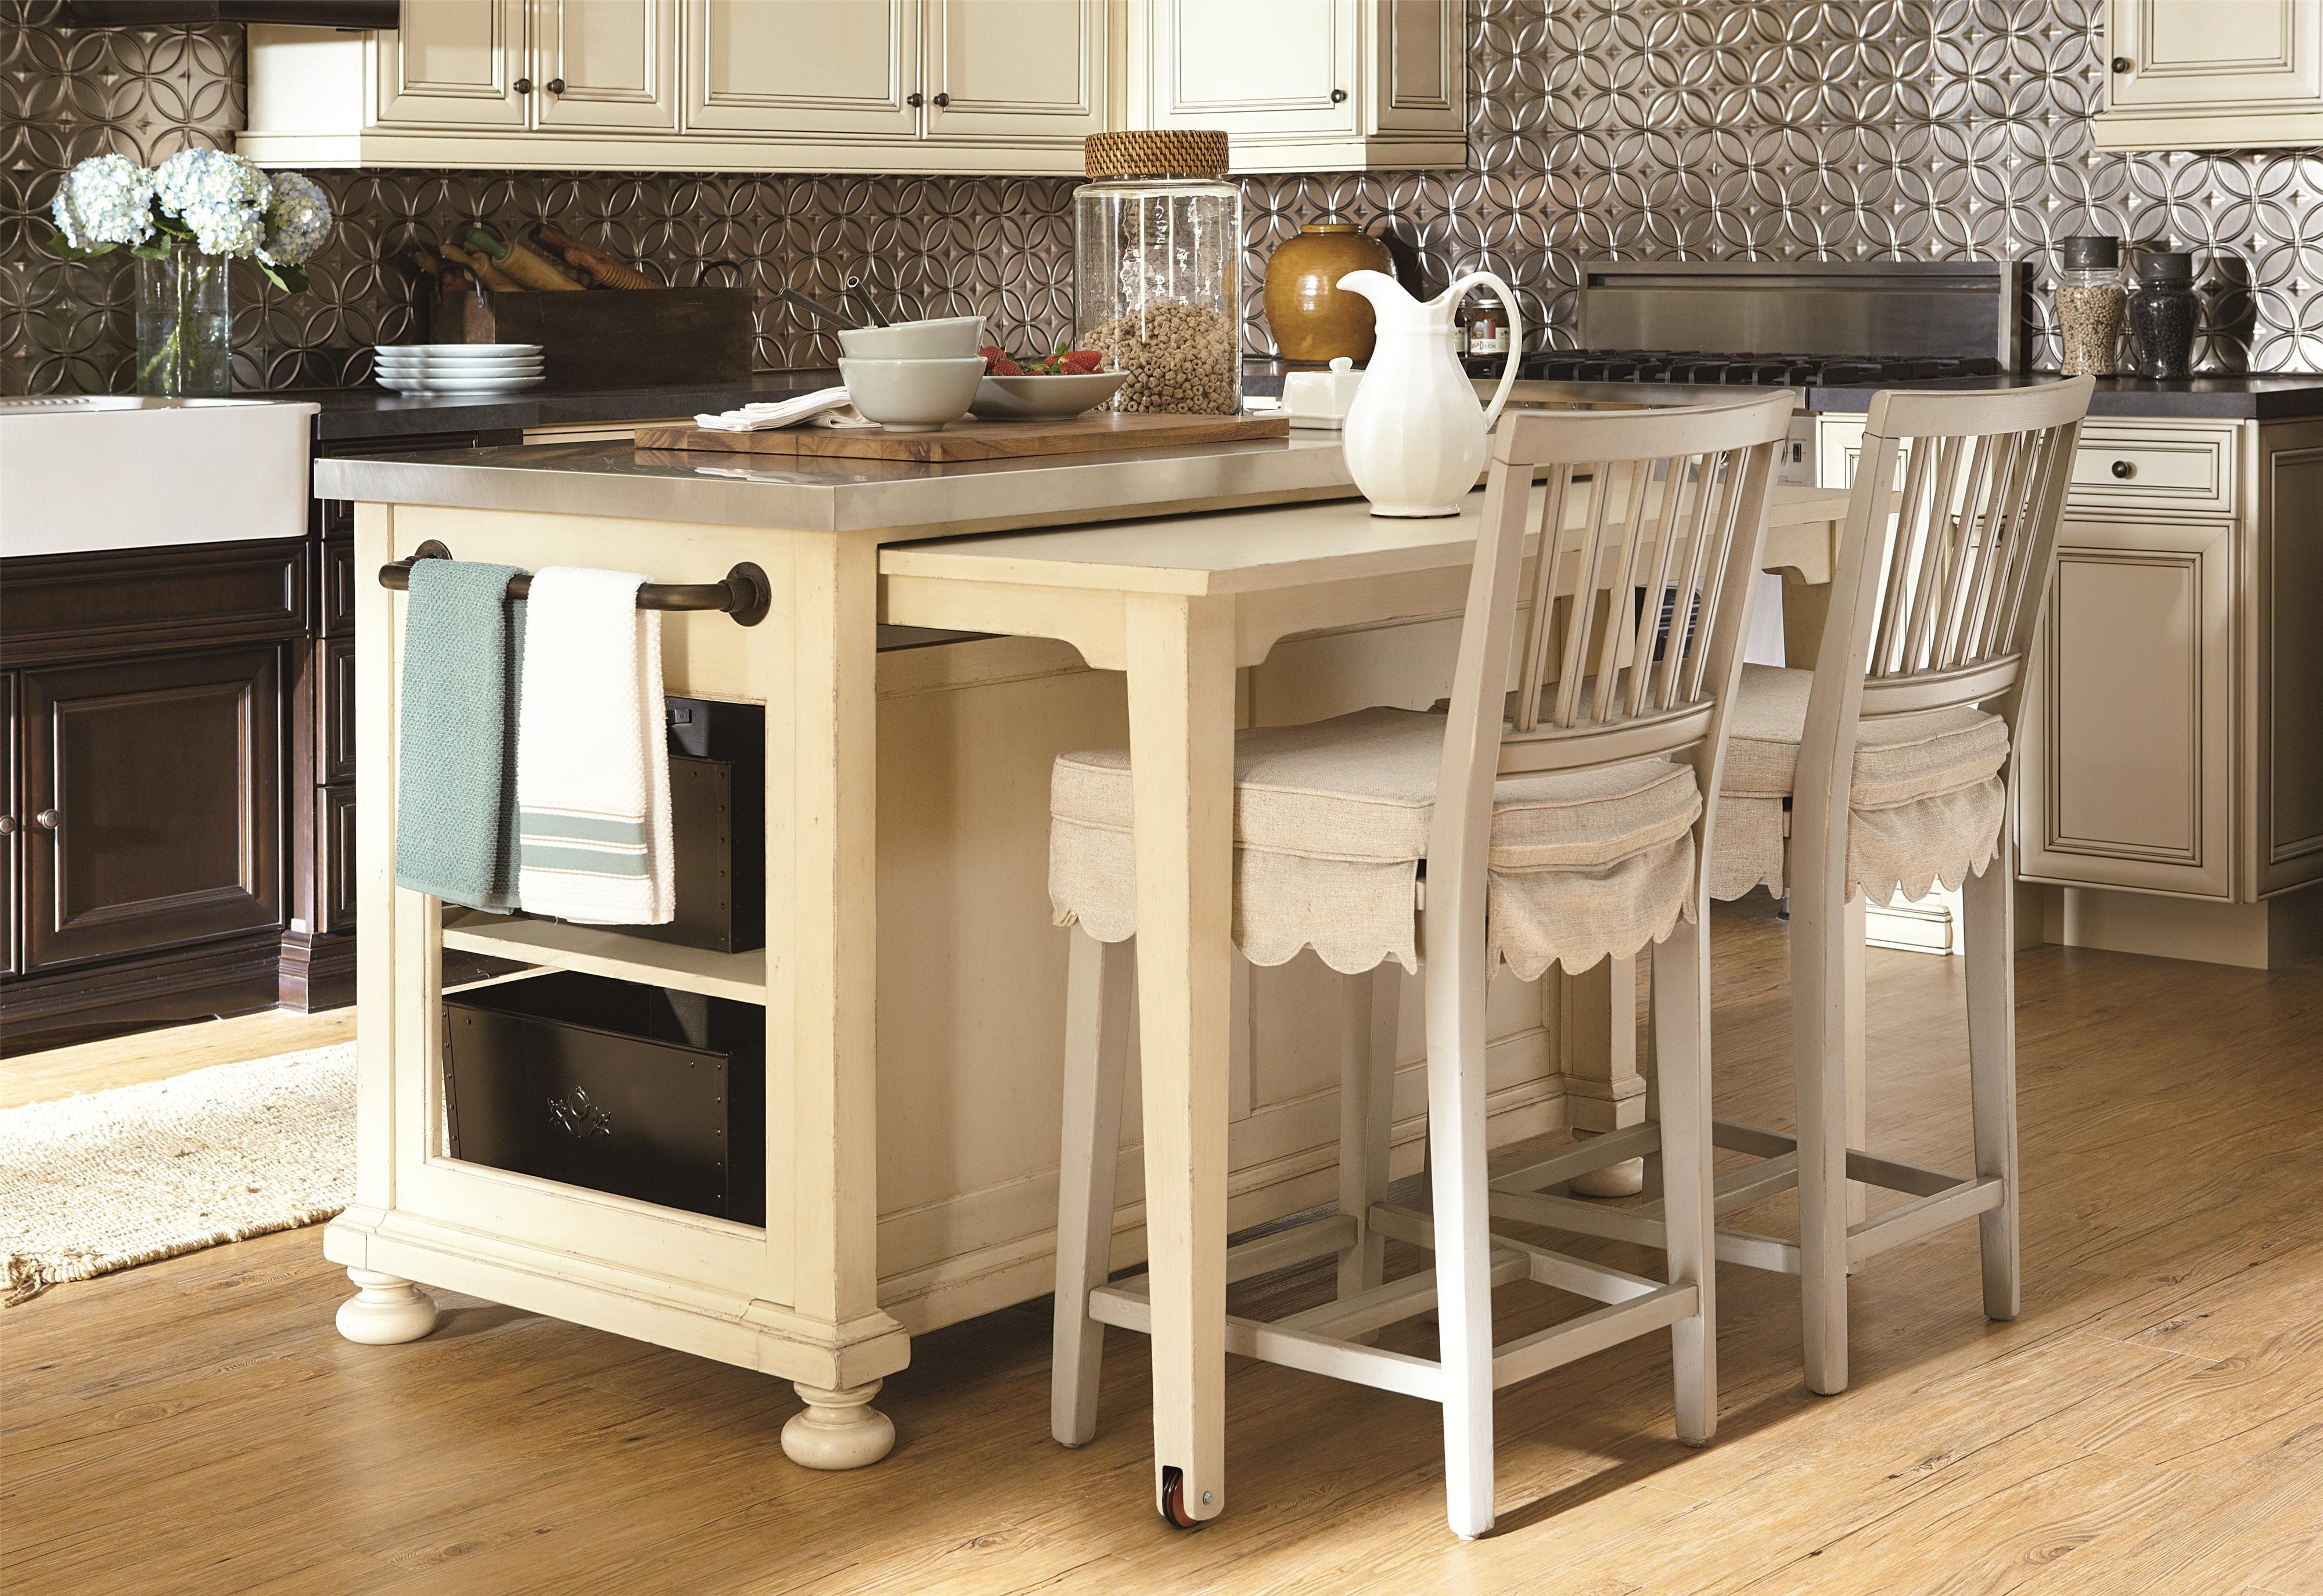 Beautiful kitchen island decor paula deen universal furniture pauladeen kitchen island